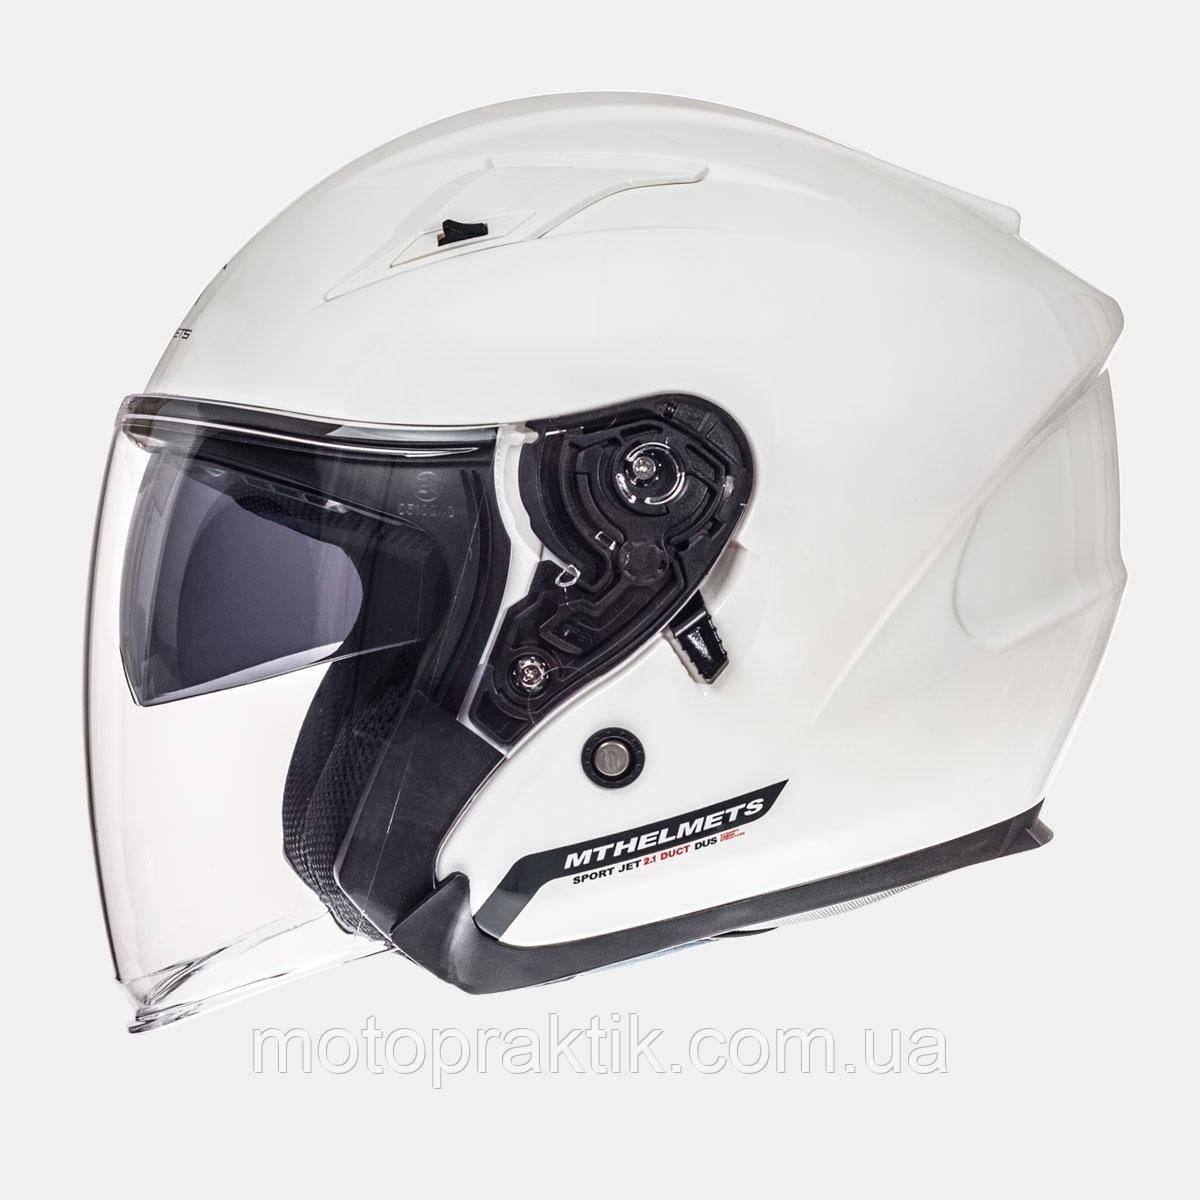 MT Avenue SV Solid Gloss Pearl White, XS, Мотошлем лицевик с очками